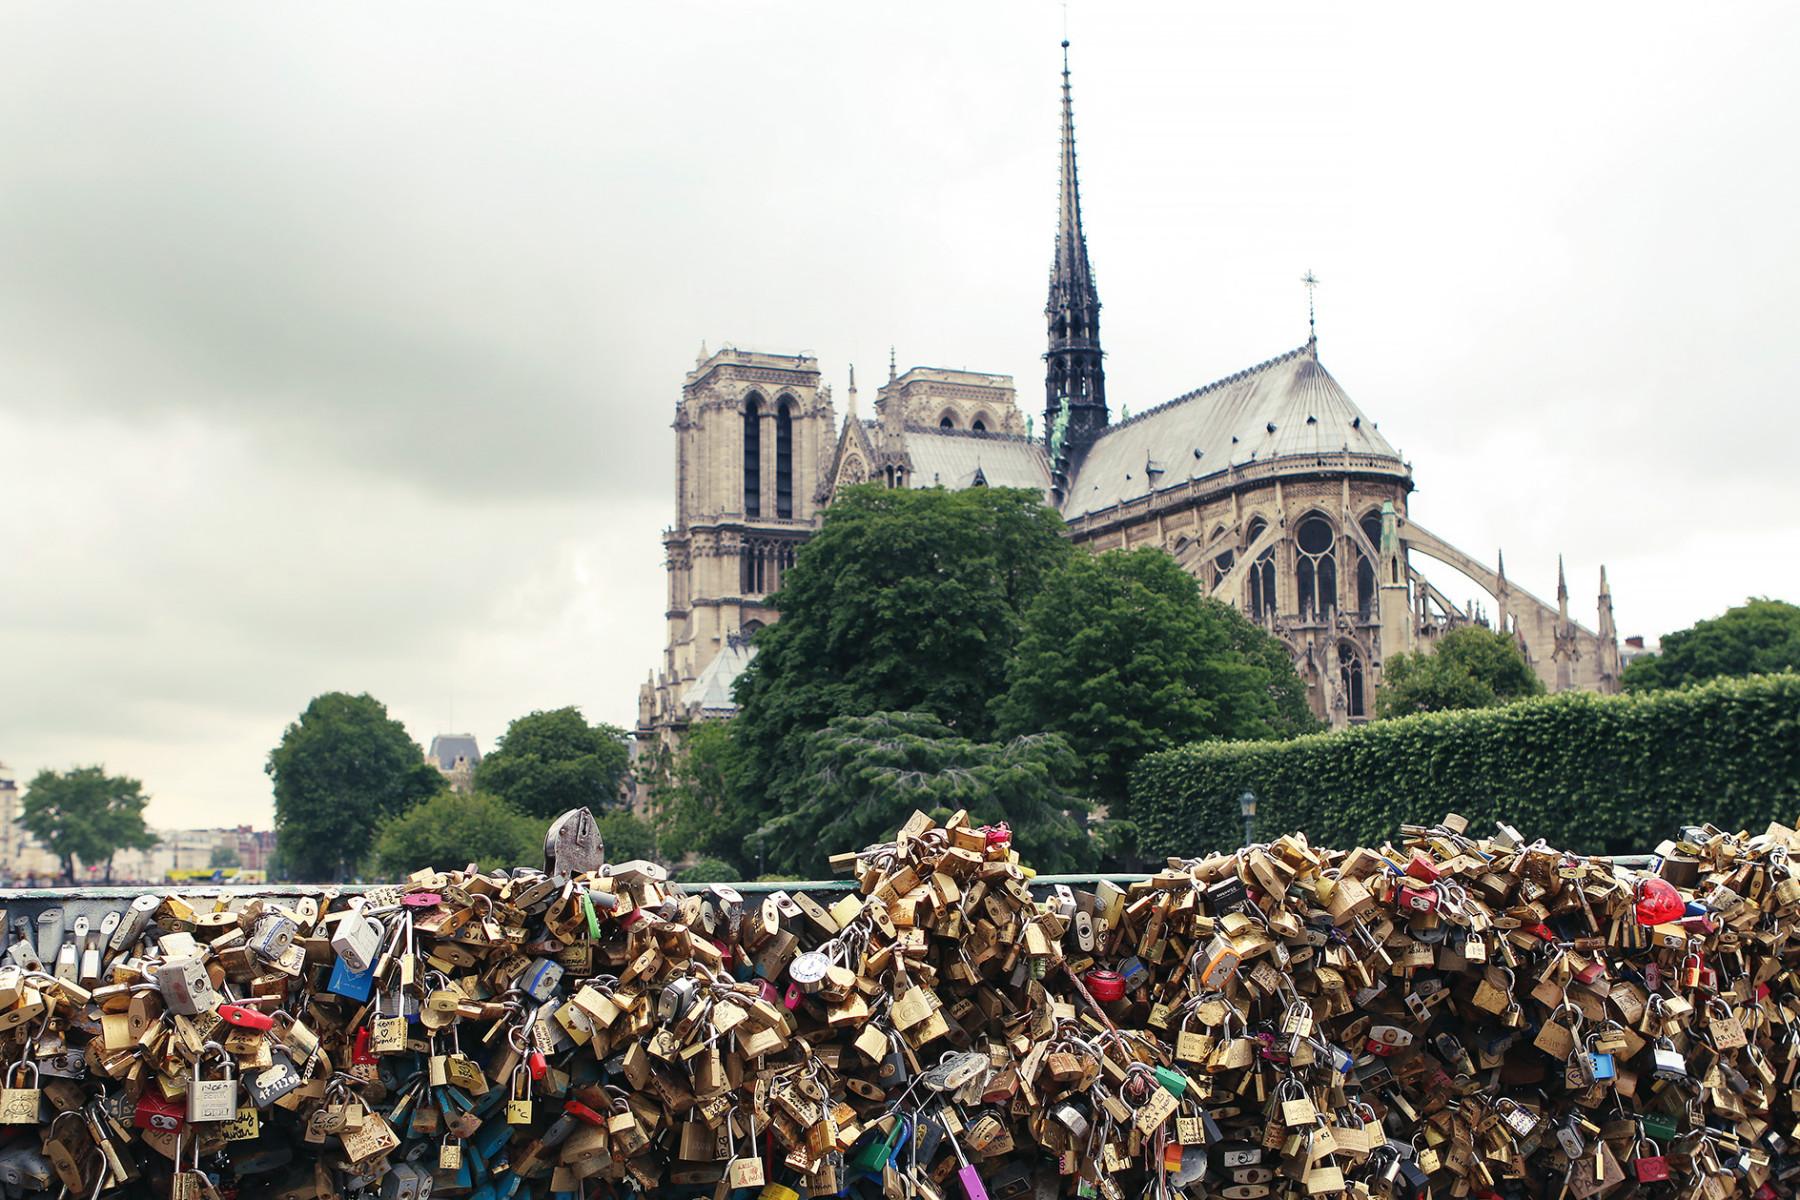 Notre Dame from Padlock Bridge